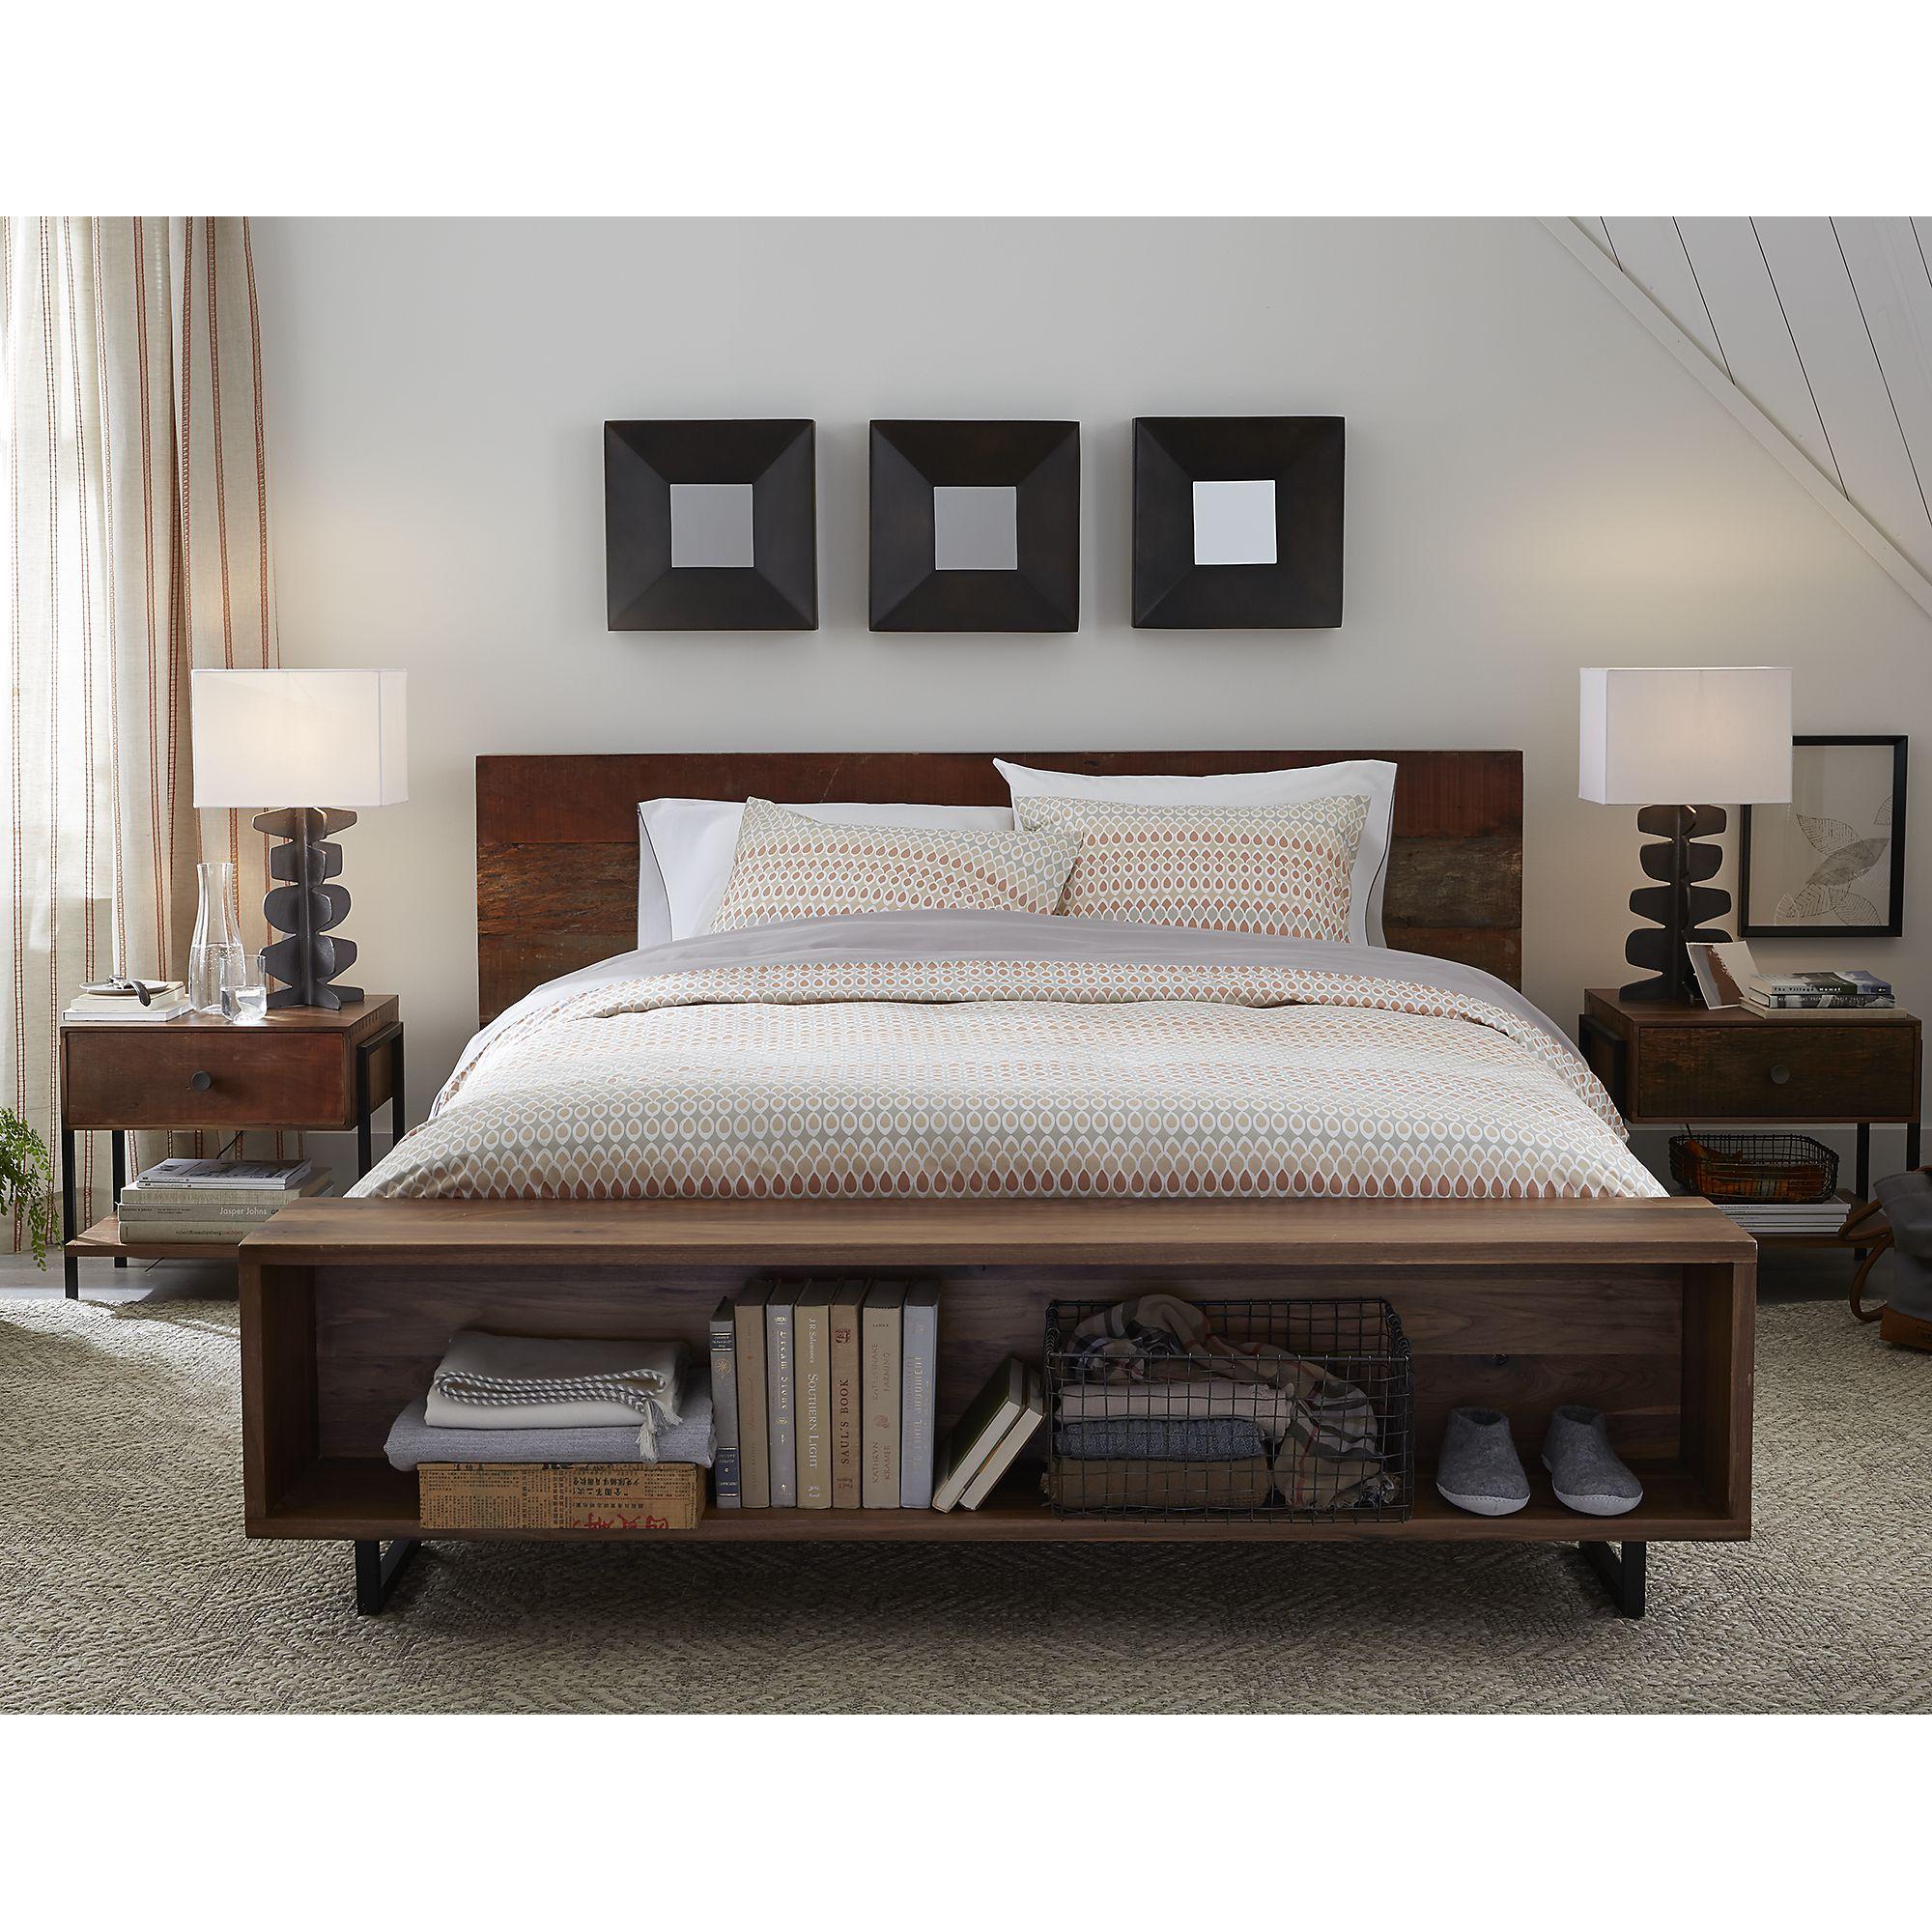 Banjara Duvet Covers And Pillow Shams Crate And Barrel Furniture